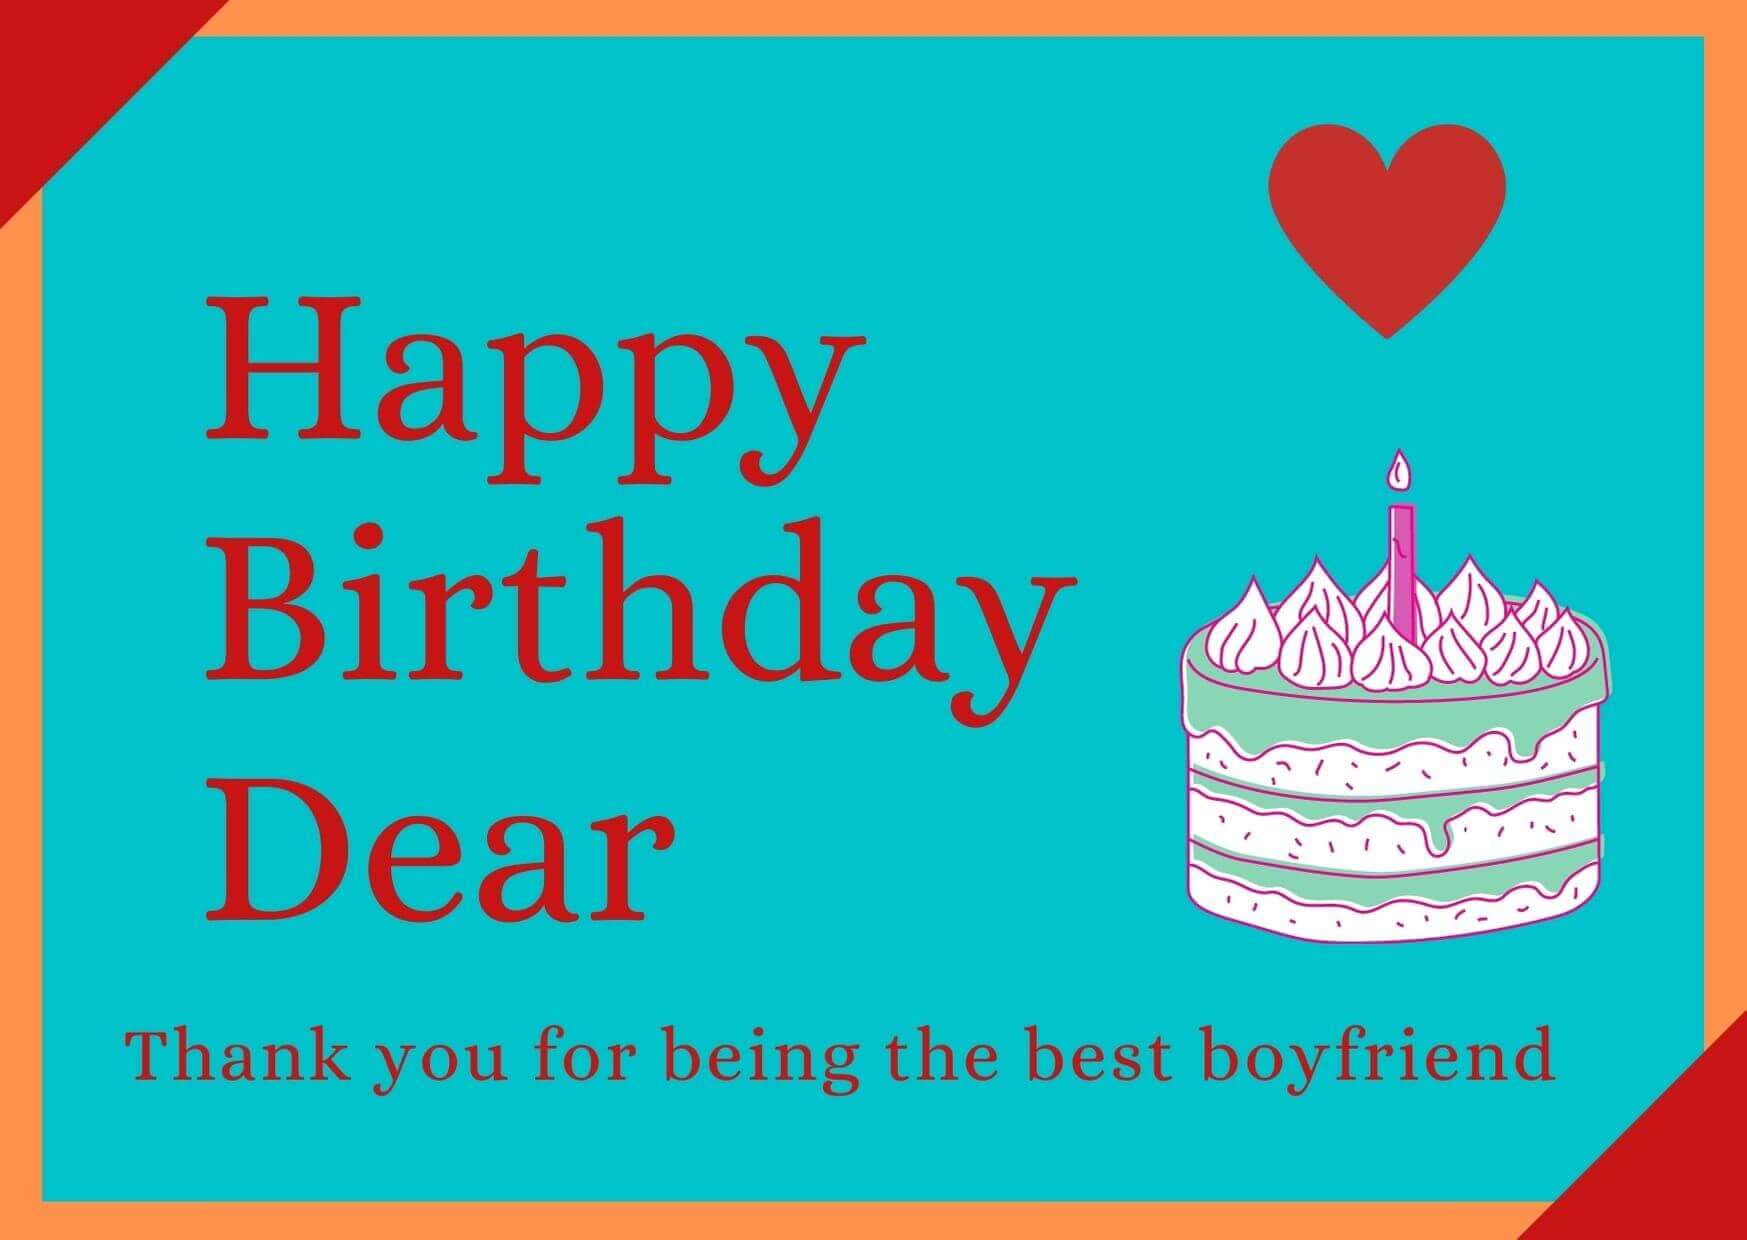 Birthday Wishes for Boyfriend free image